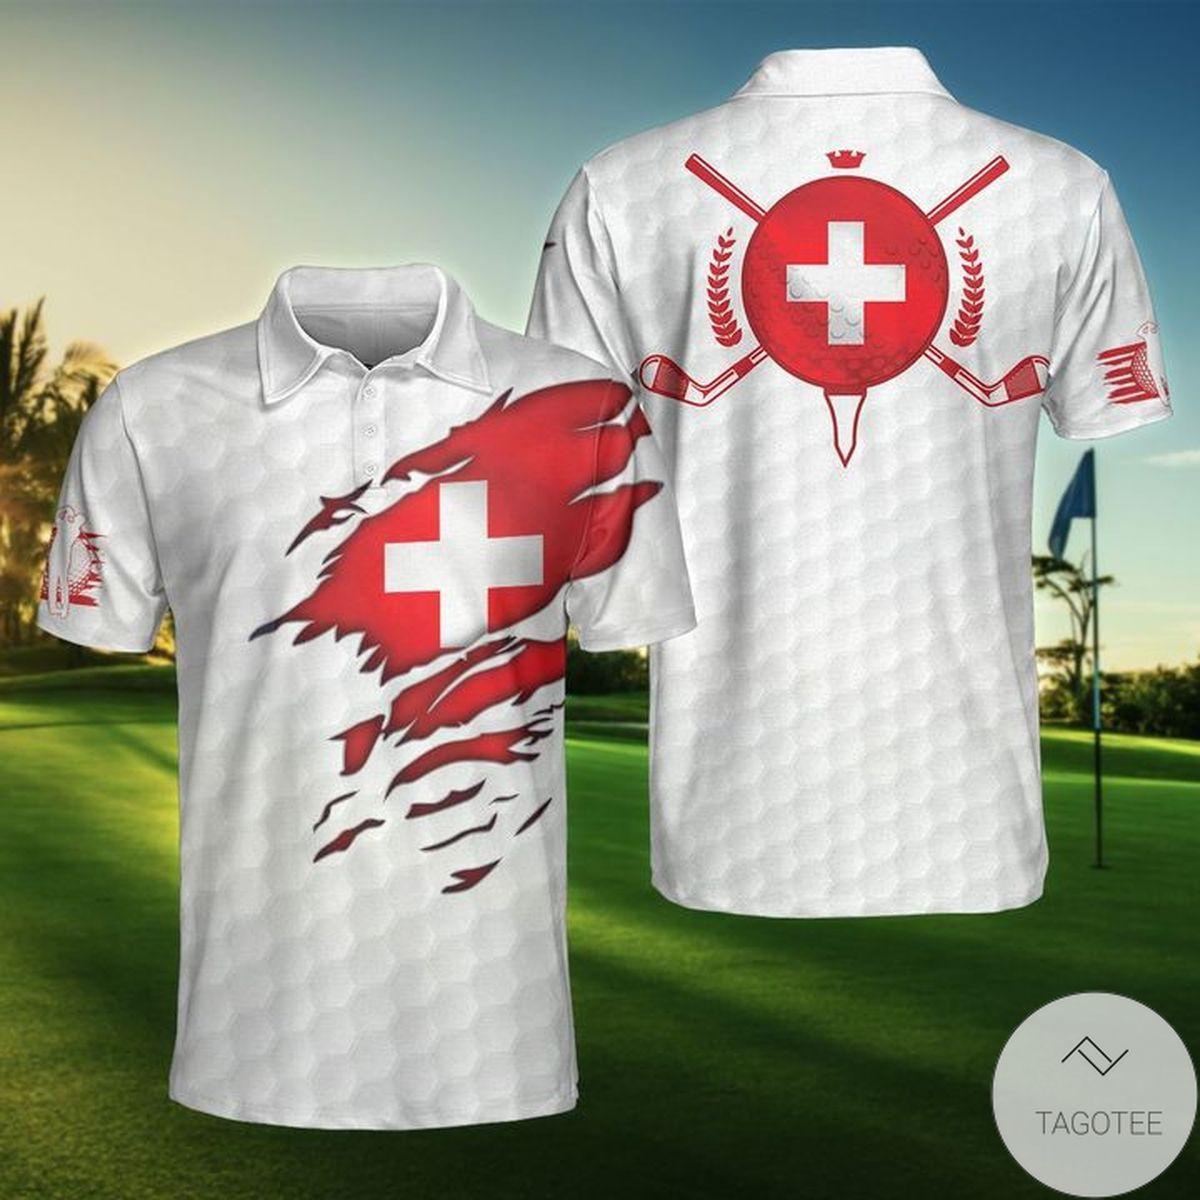 Switzerland Flag Golfer Polo Shirt